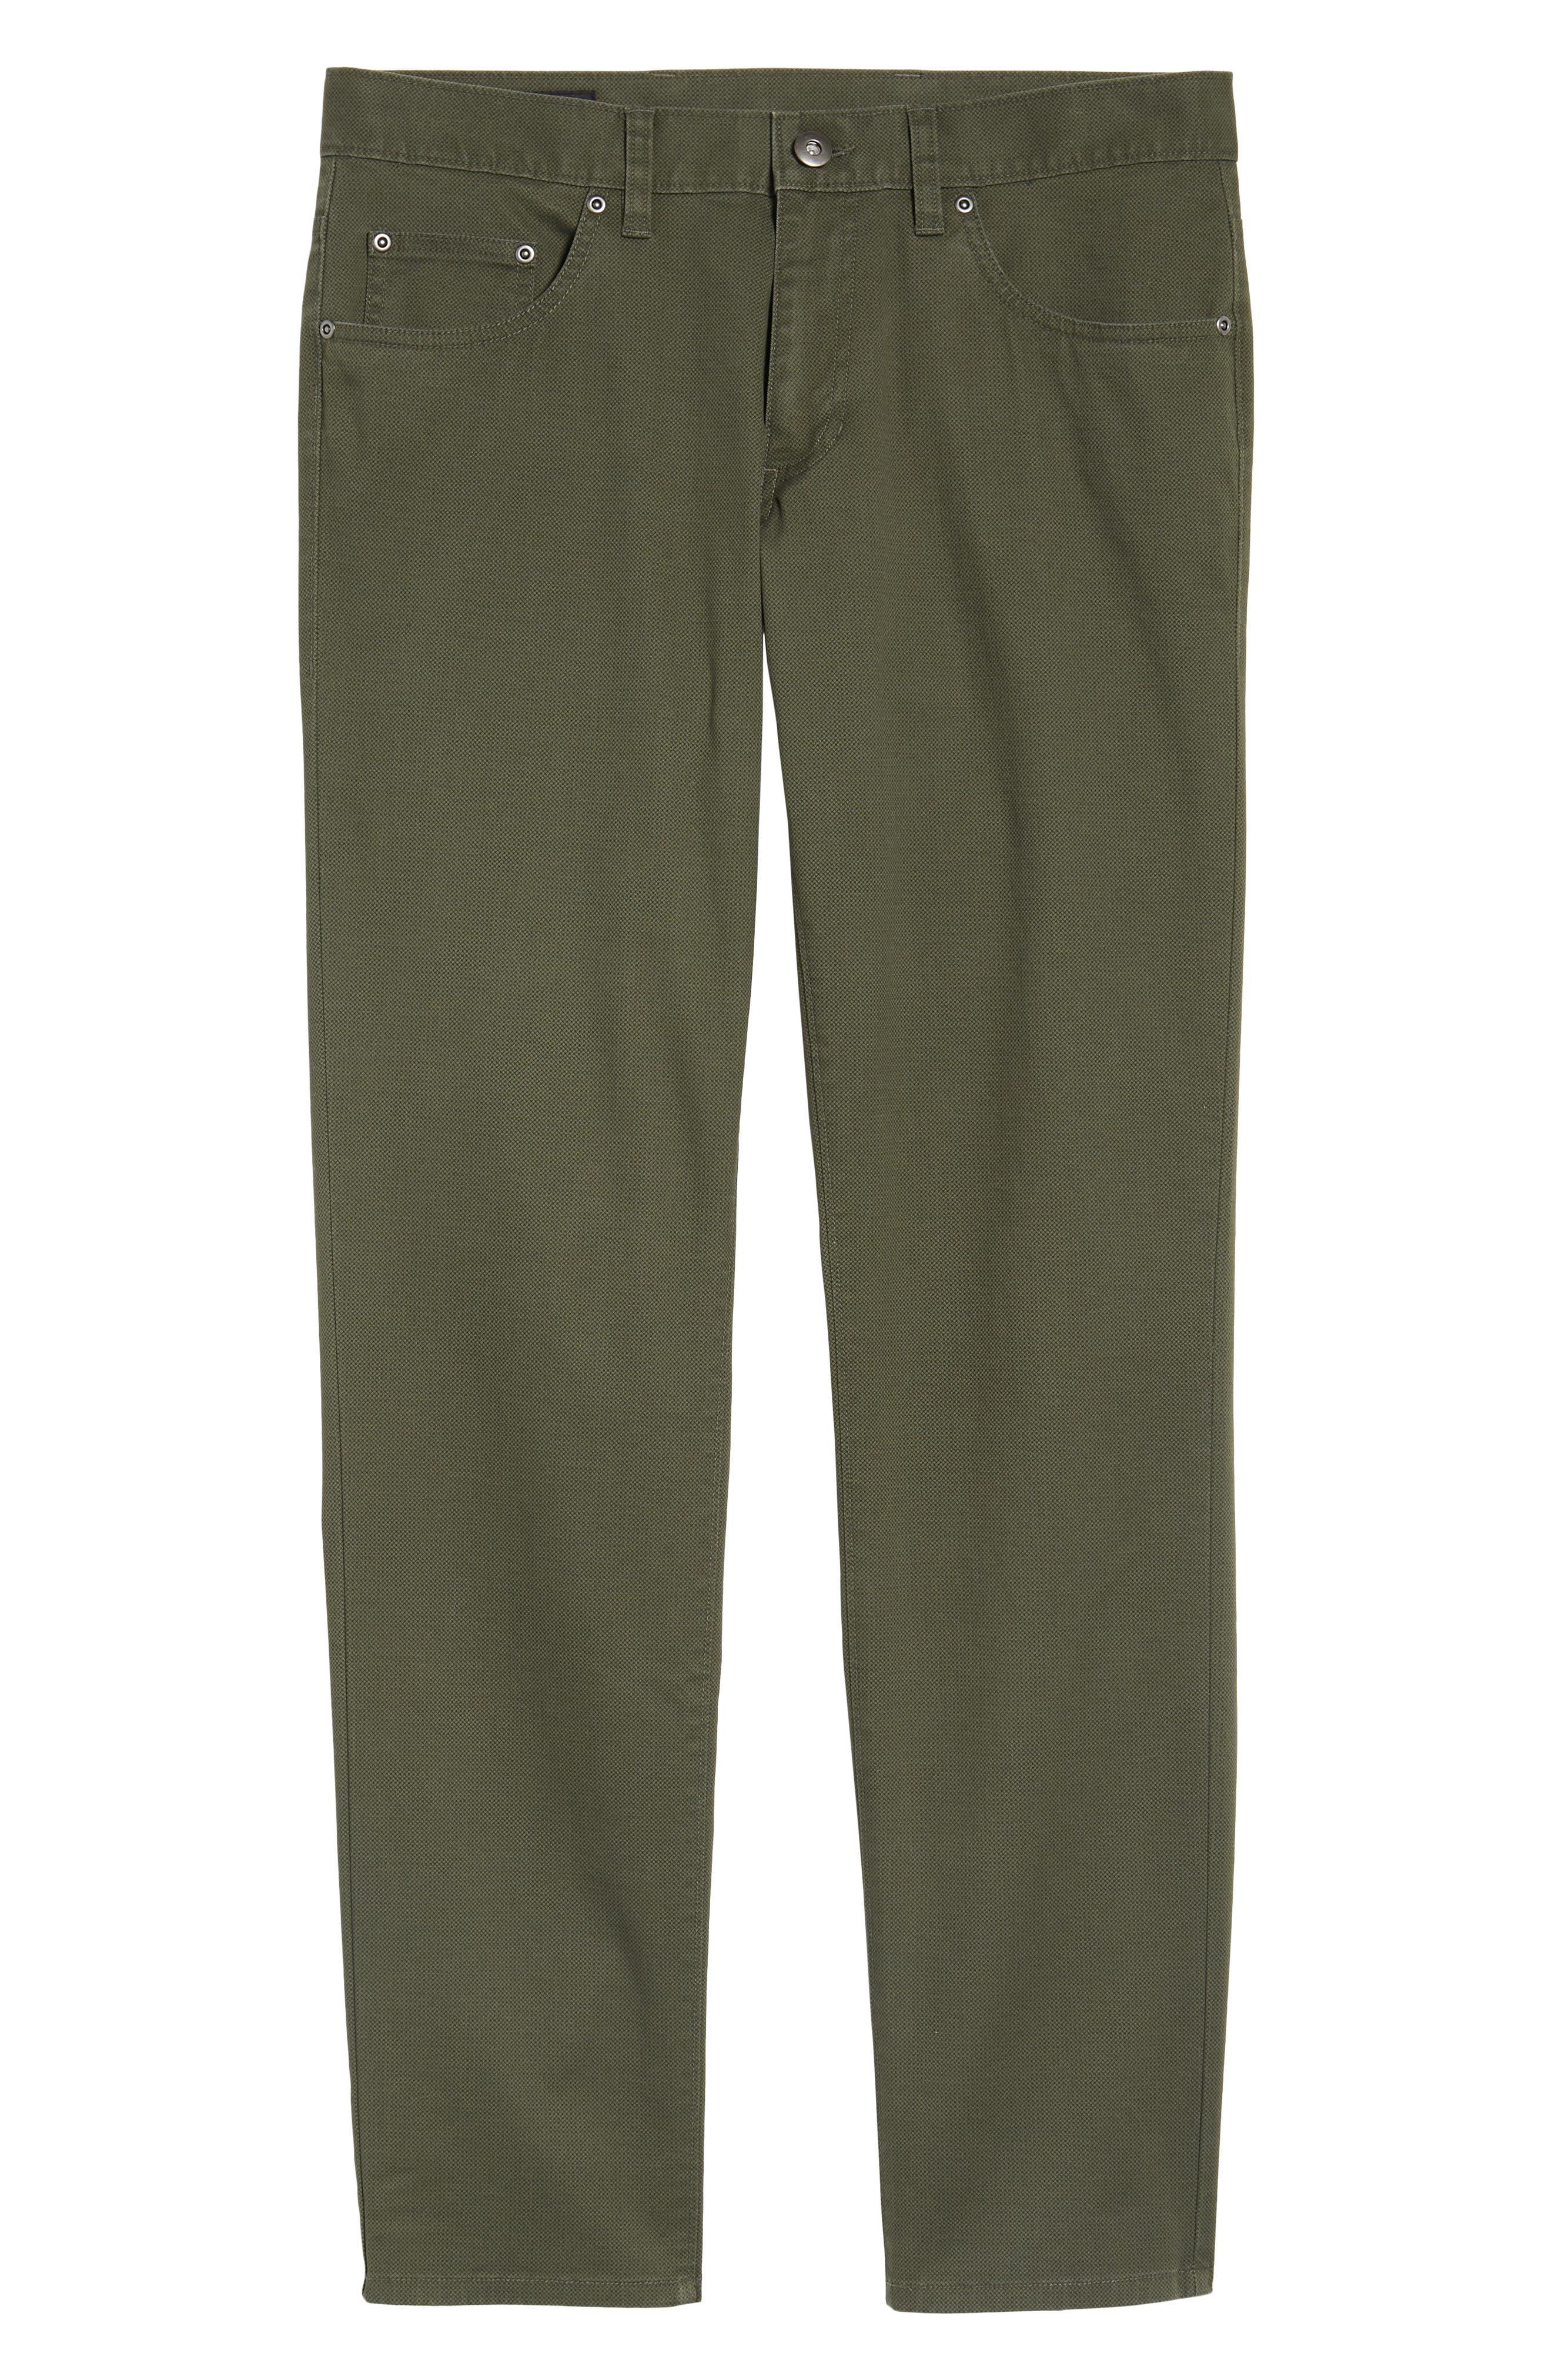 Textured Stretch Cotton Pants,                             Alternate thumbnail 6, color,                             301